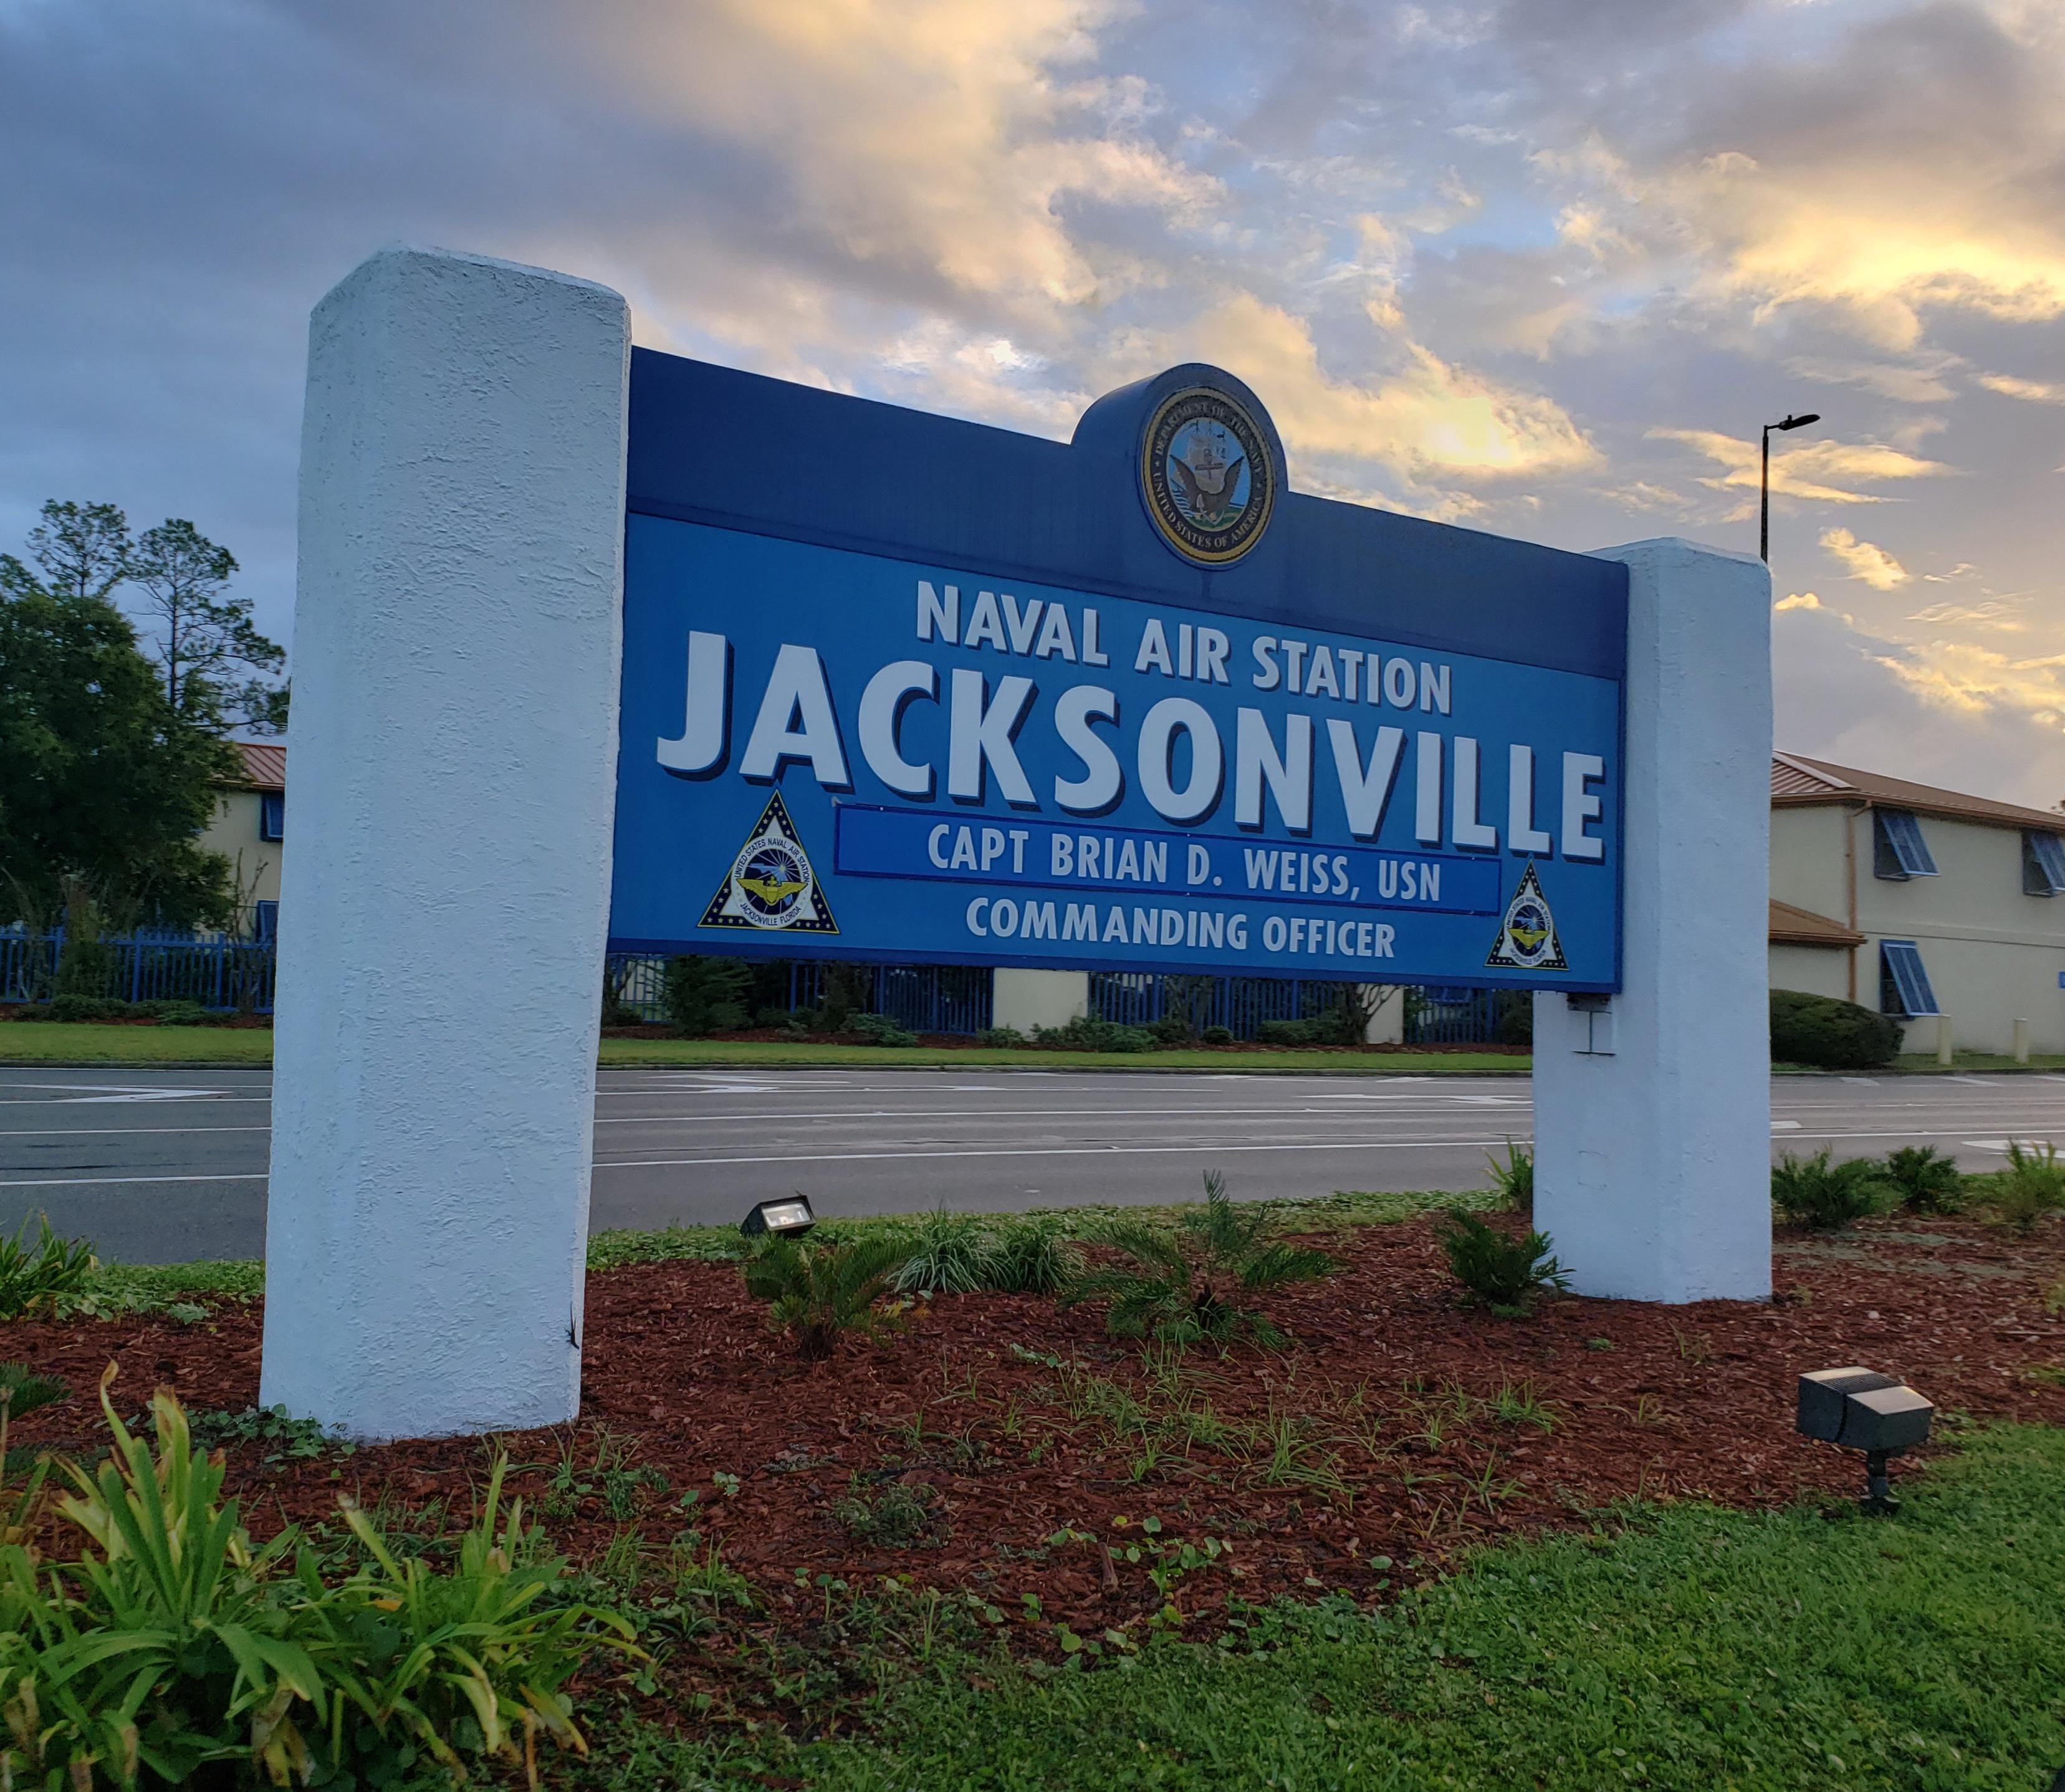 NAS Jacksonville